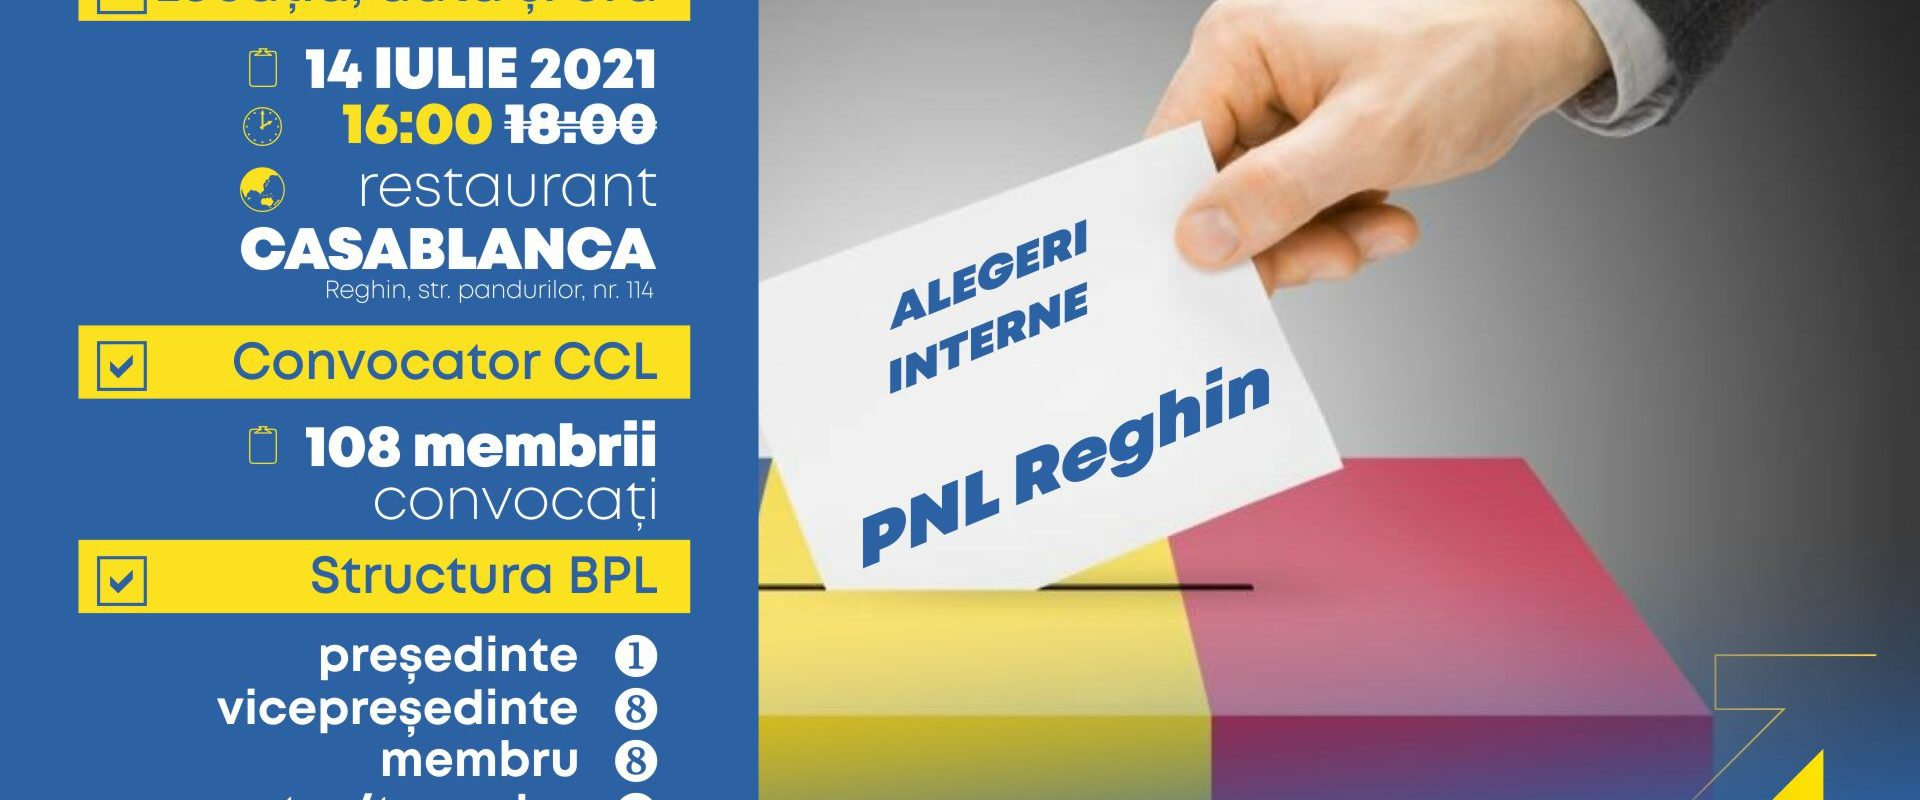 Alegeri interne 2021